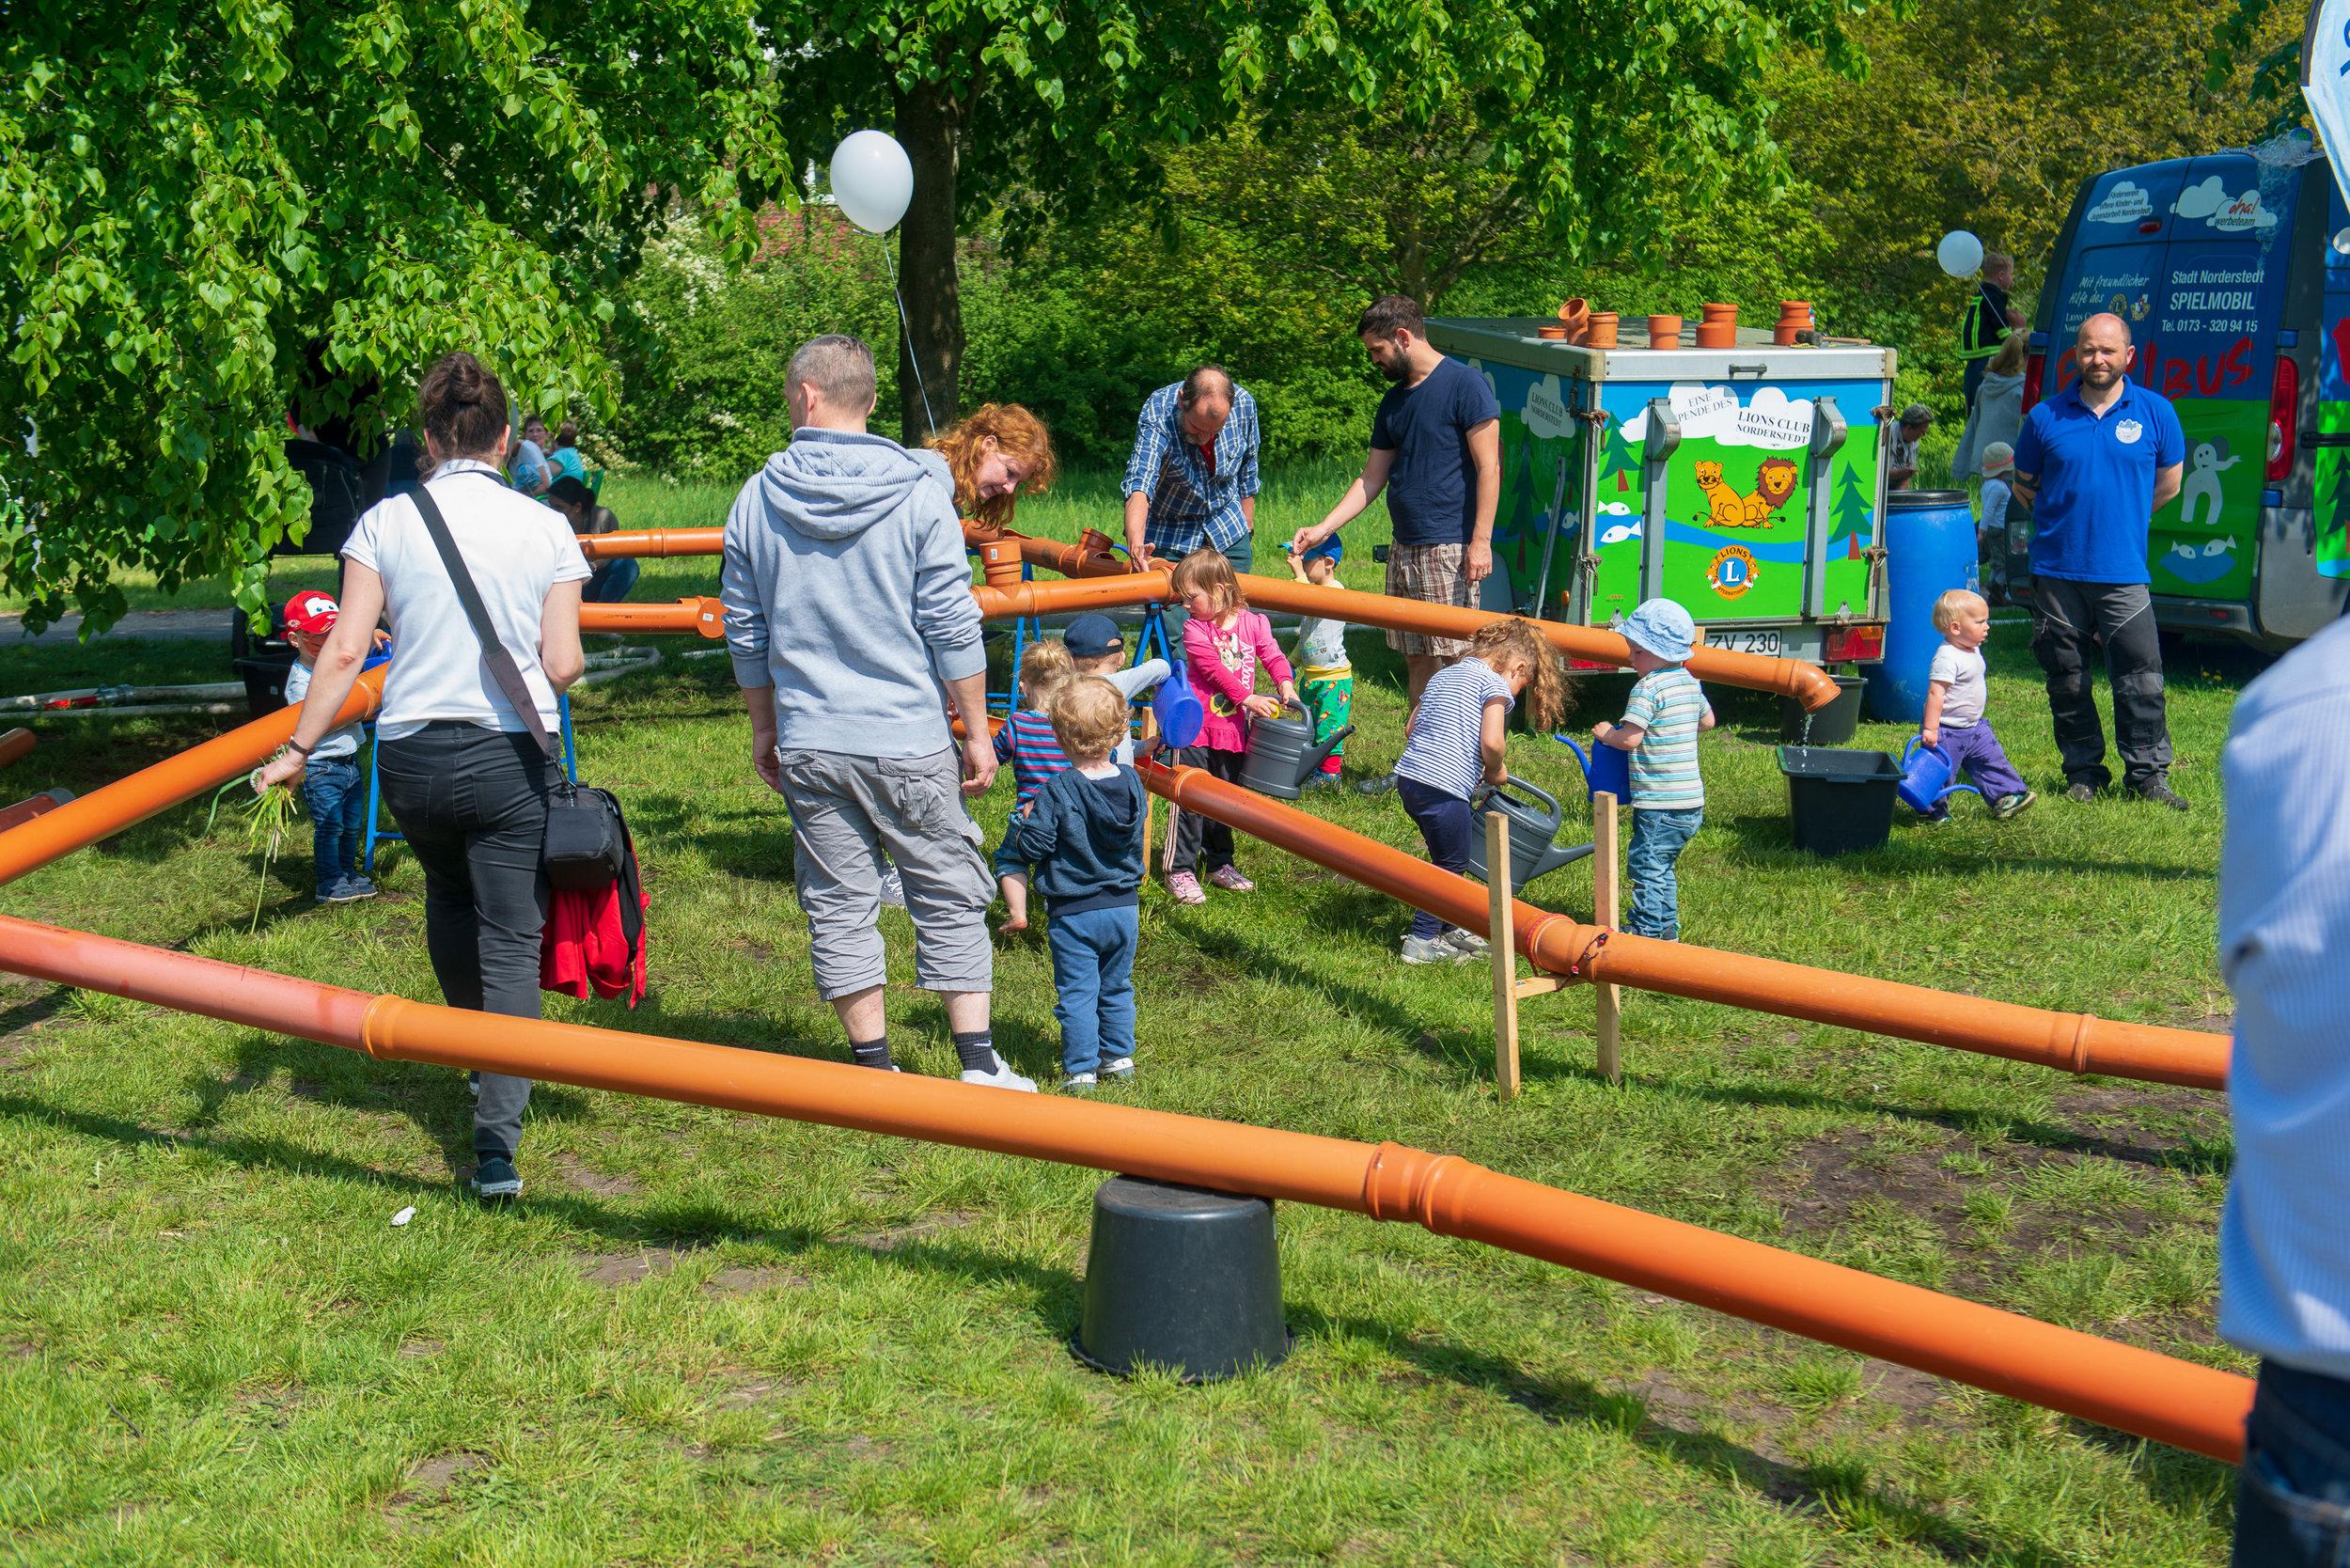 13-Norderstedter-Museumsfest-2019-FWM--XO-Dennys-Mamero-WEB-37.jpg